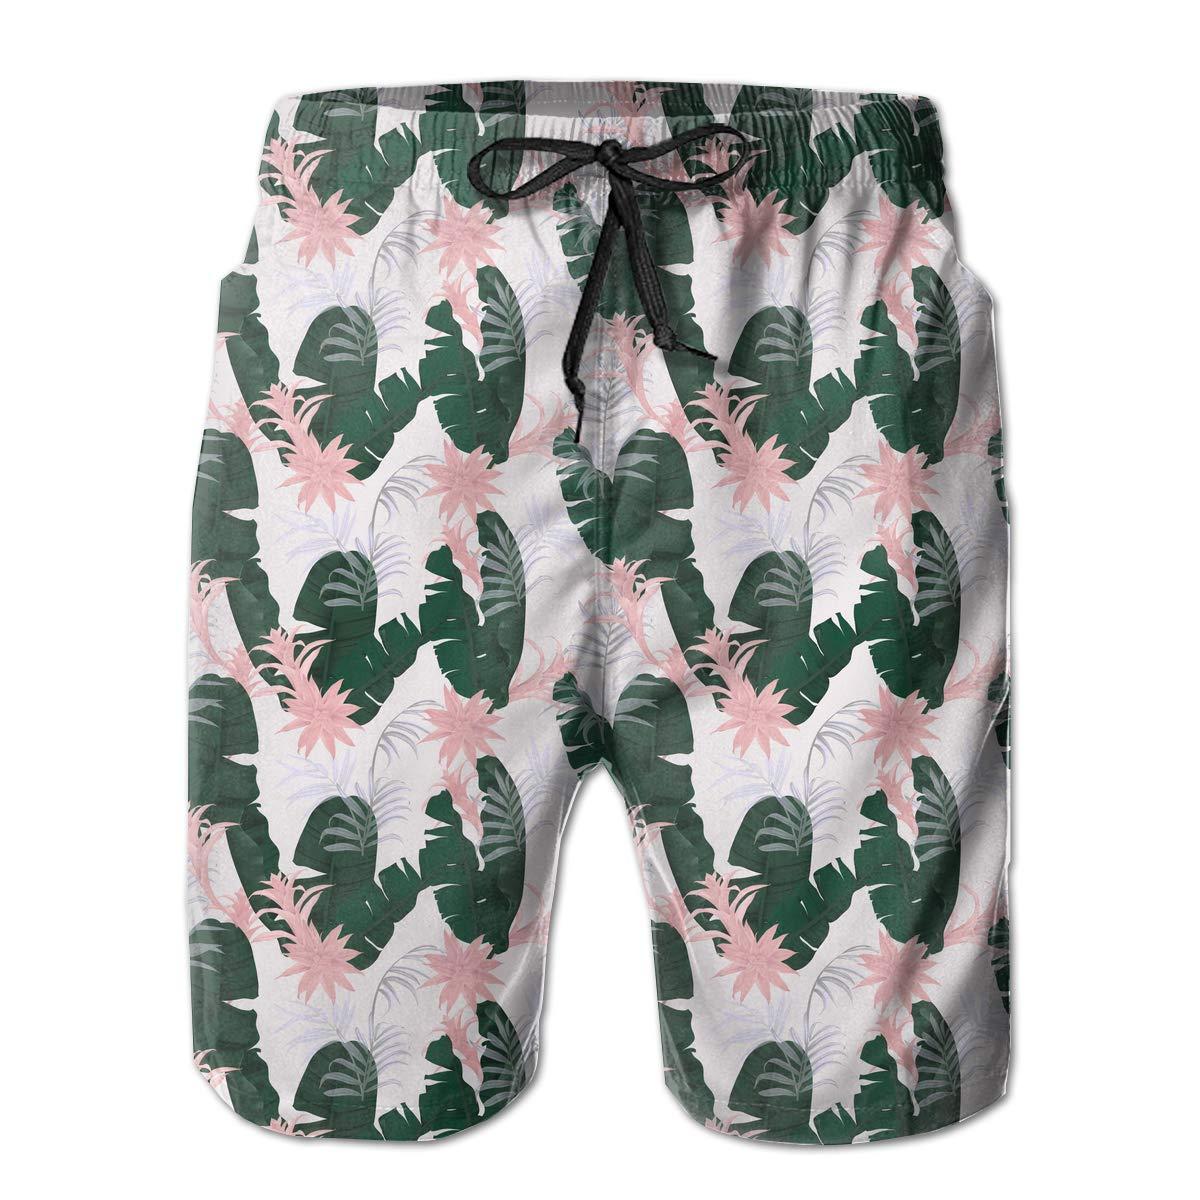 Floral Plant Palm Leaves Pattern Mens Beach Shorts Slim-Fit Bathing Suit